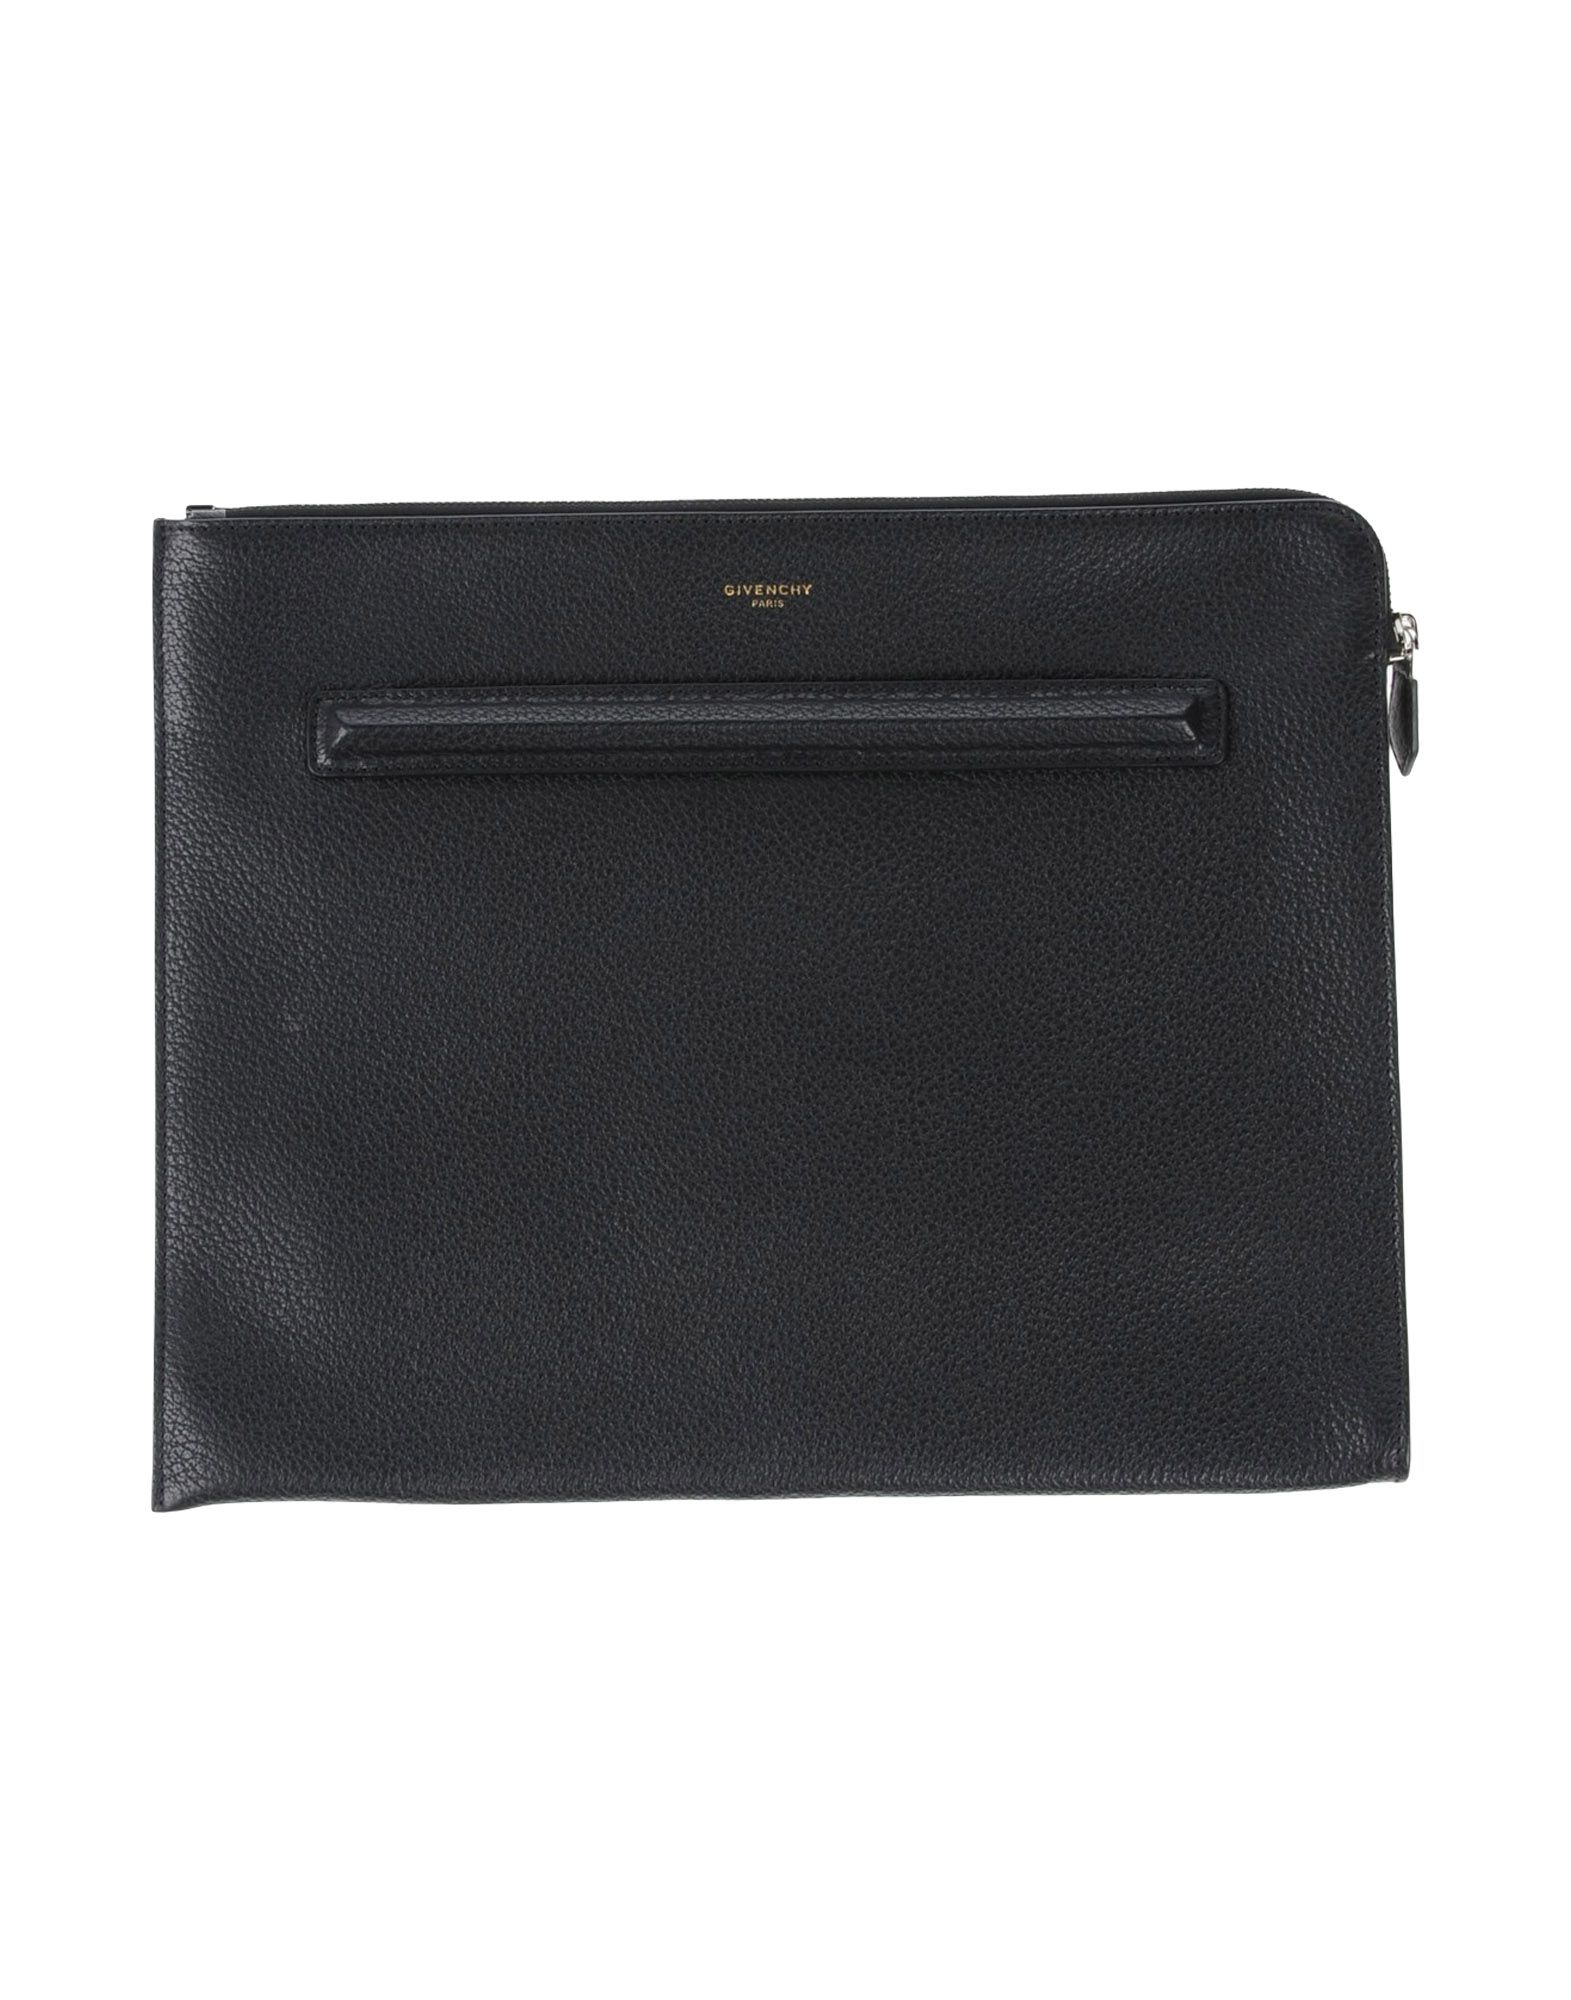 GIVENCHY Сумка на руку сумка givenchy bb0 5102 012 antigona